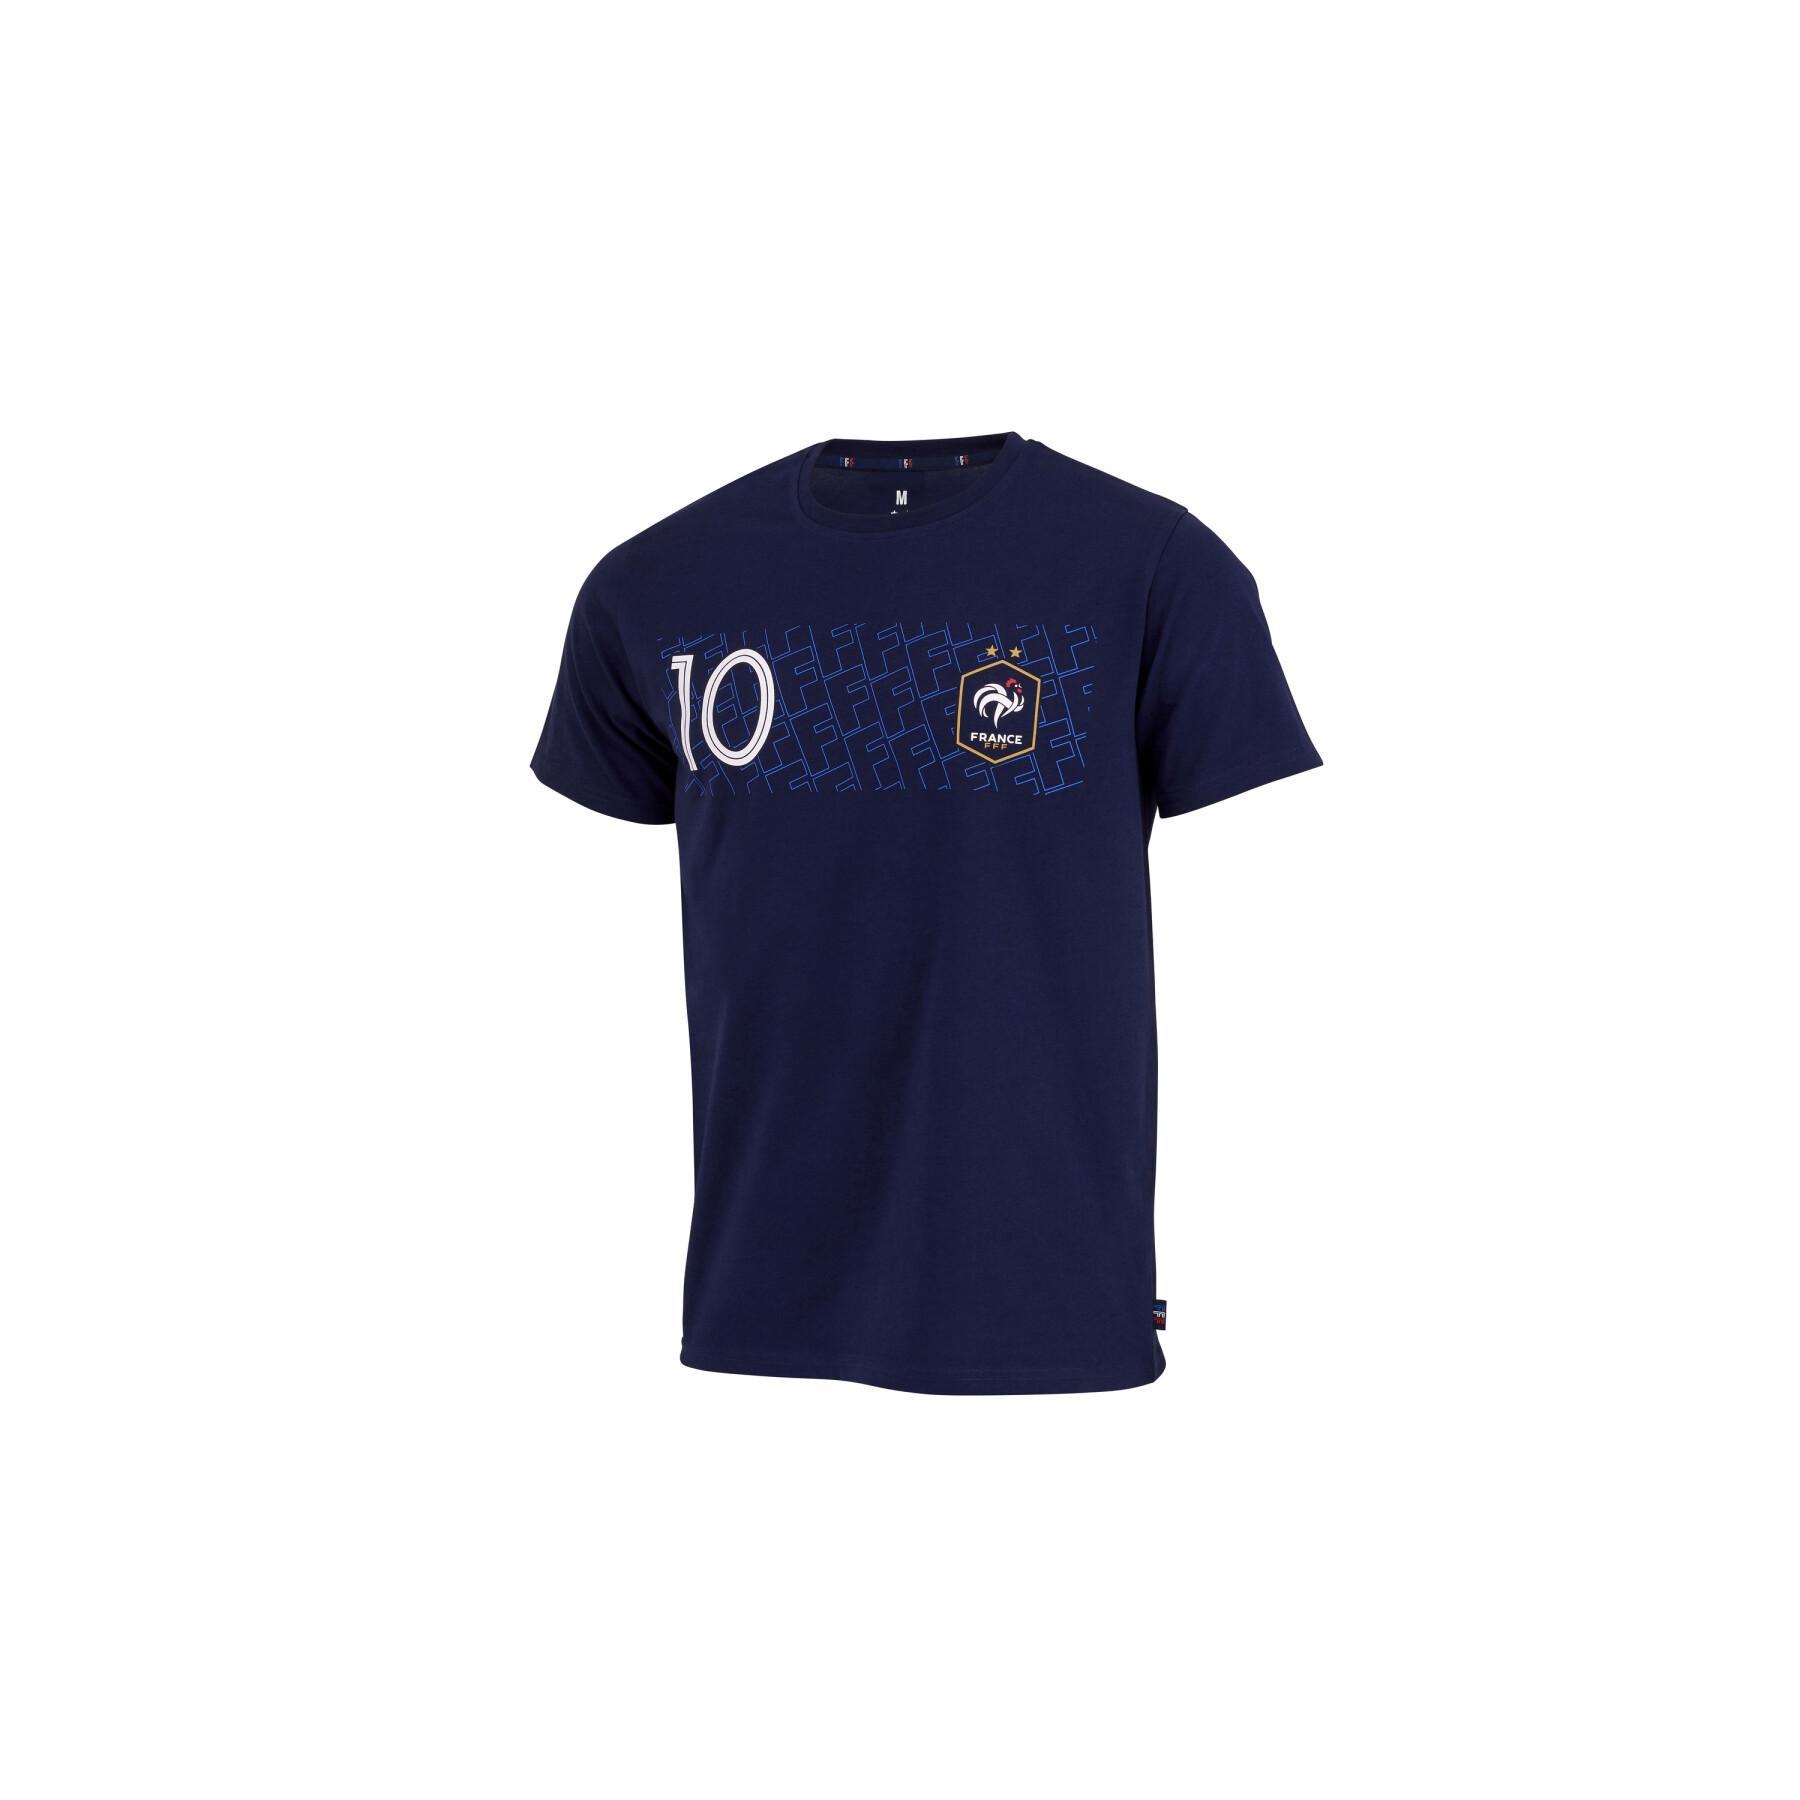 Child's T-shirt France Player Mbappe N°10